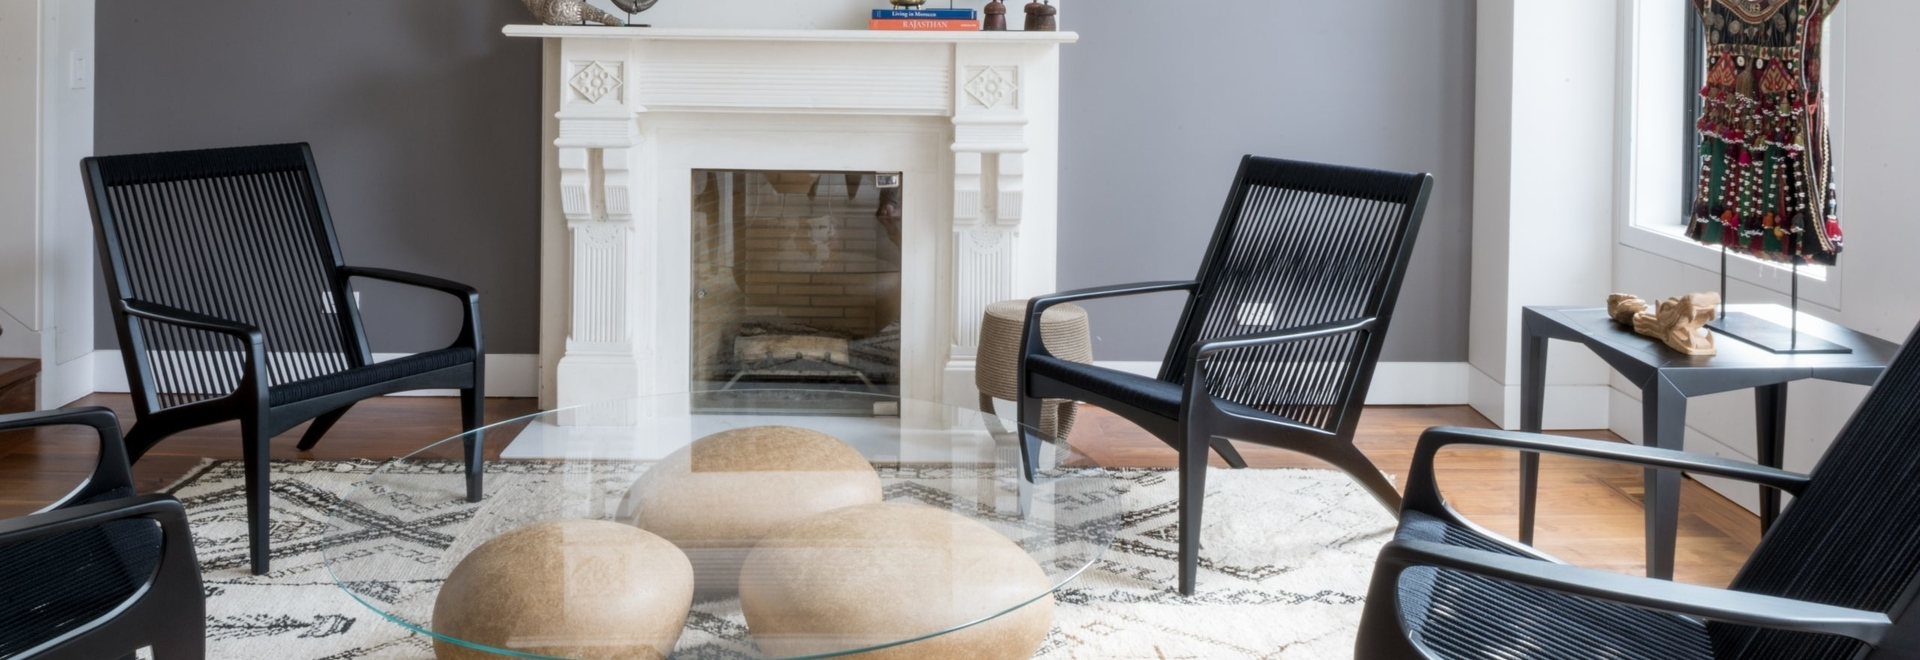 Gisele Lounge Chair by Aristeu Pires and table Água by Domingos Tótora